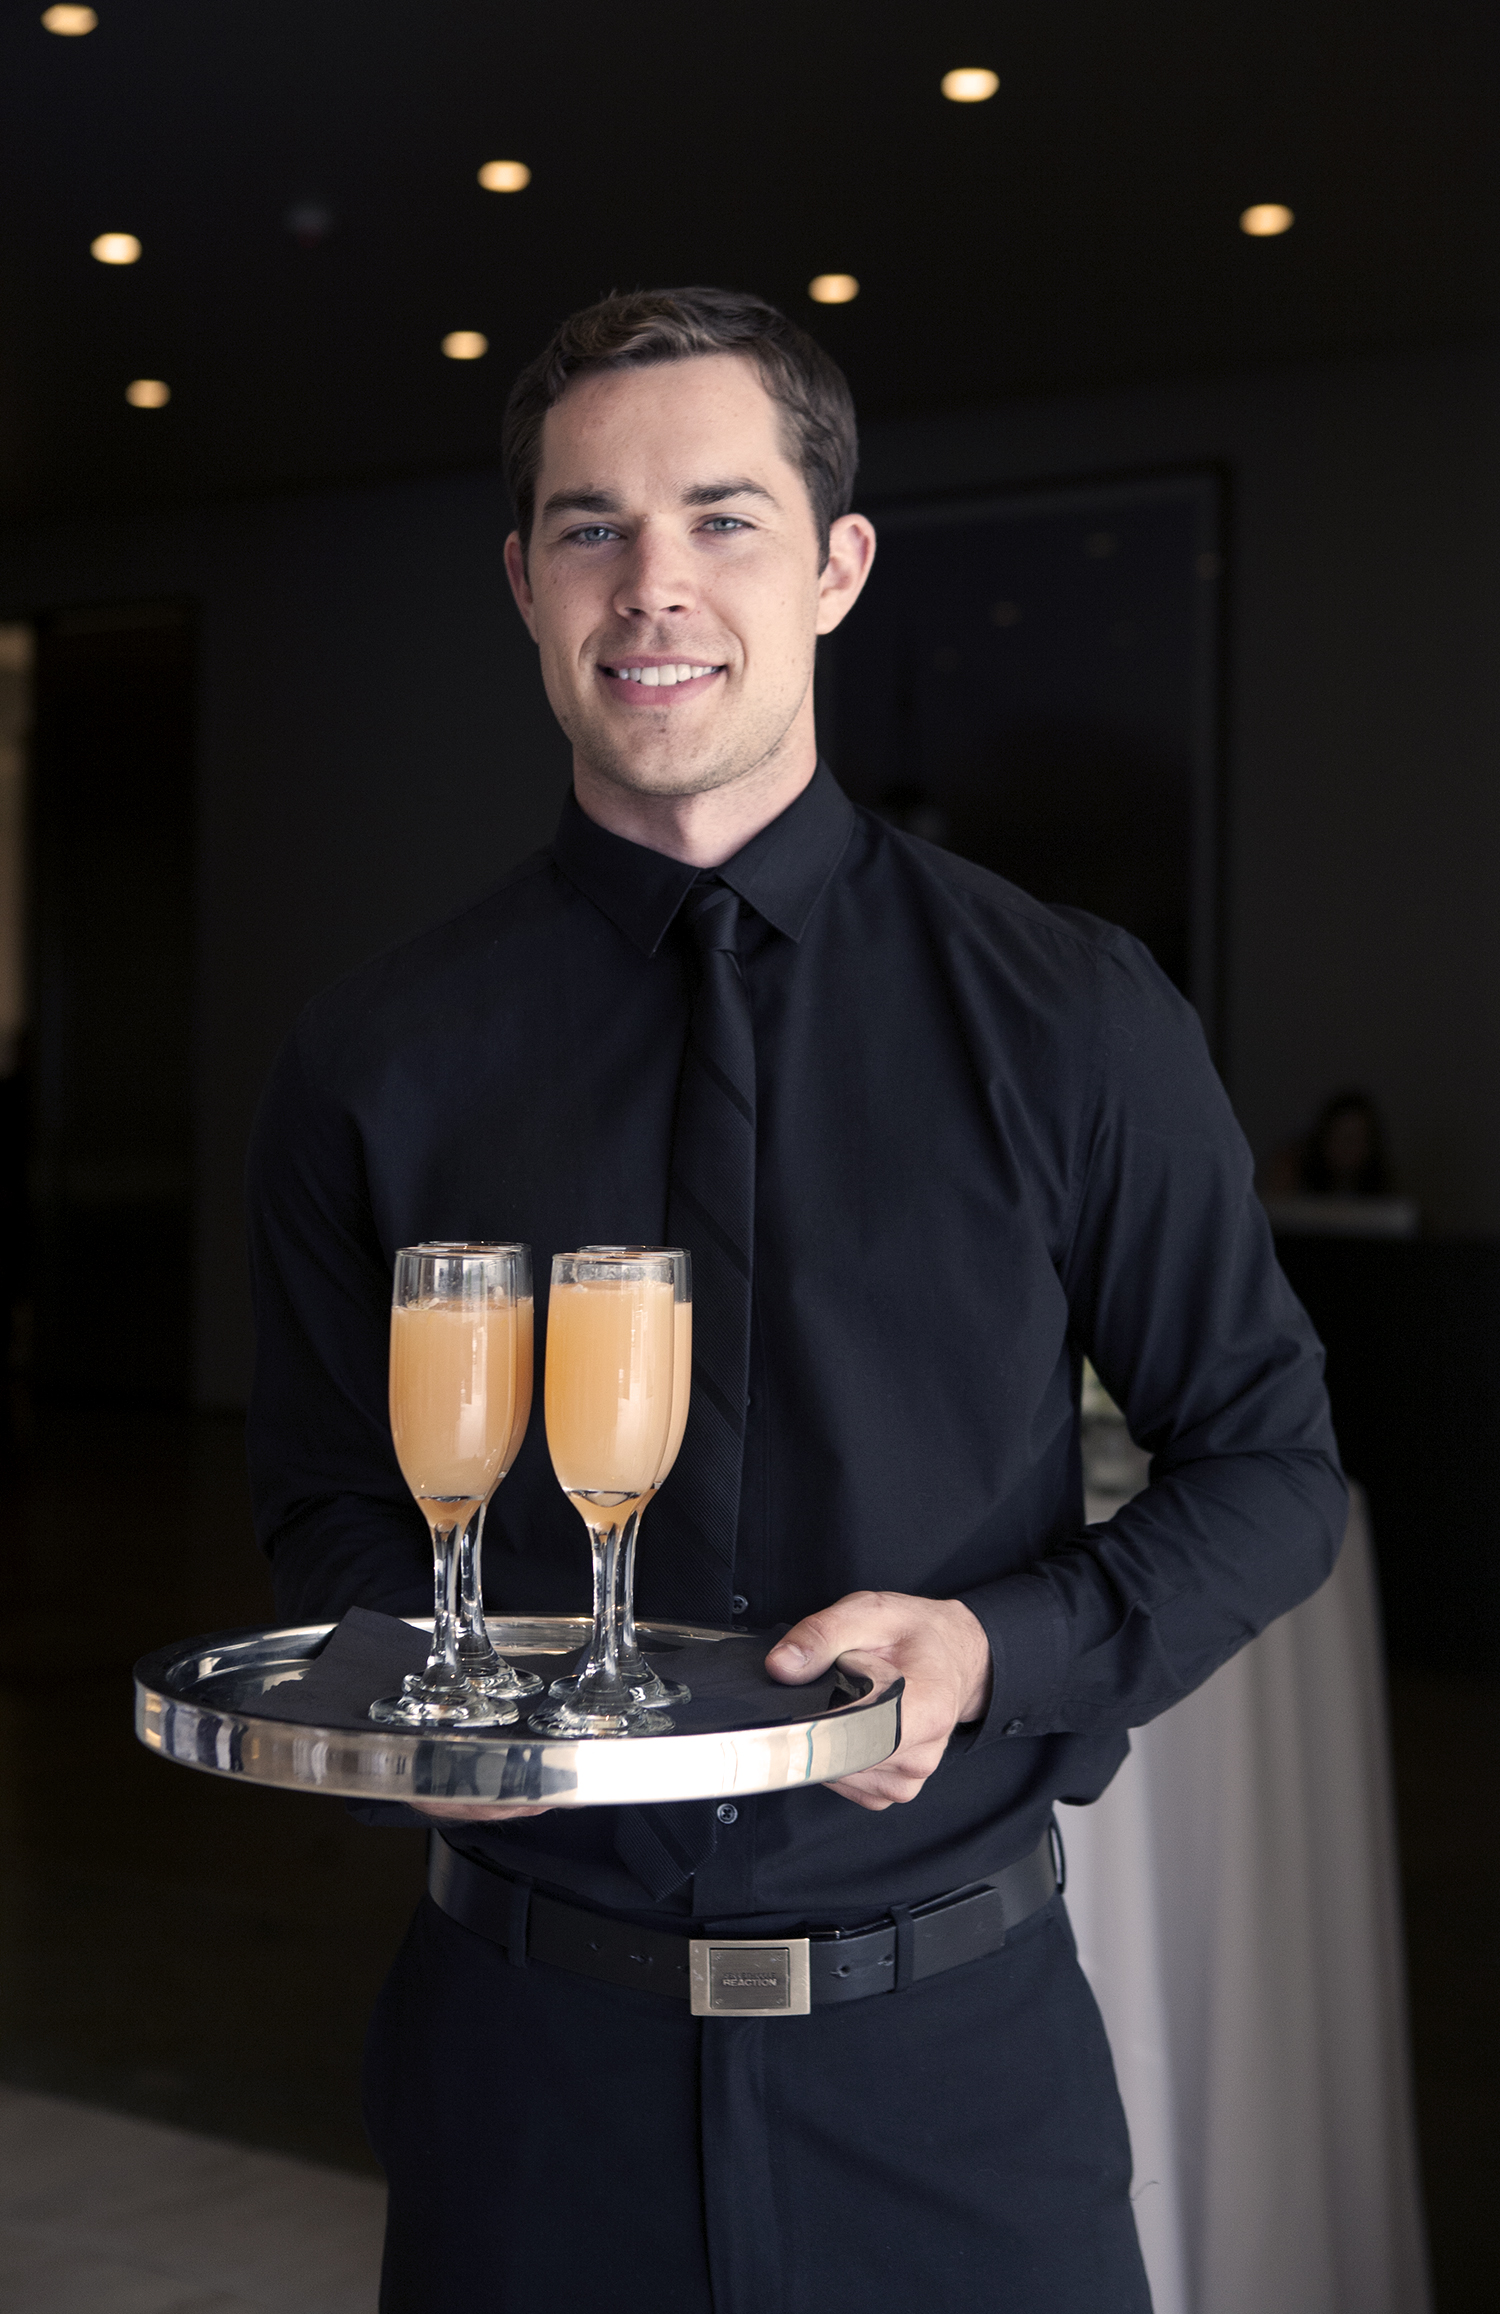 Paul cocktail serve.jpg